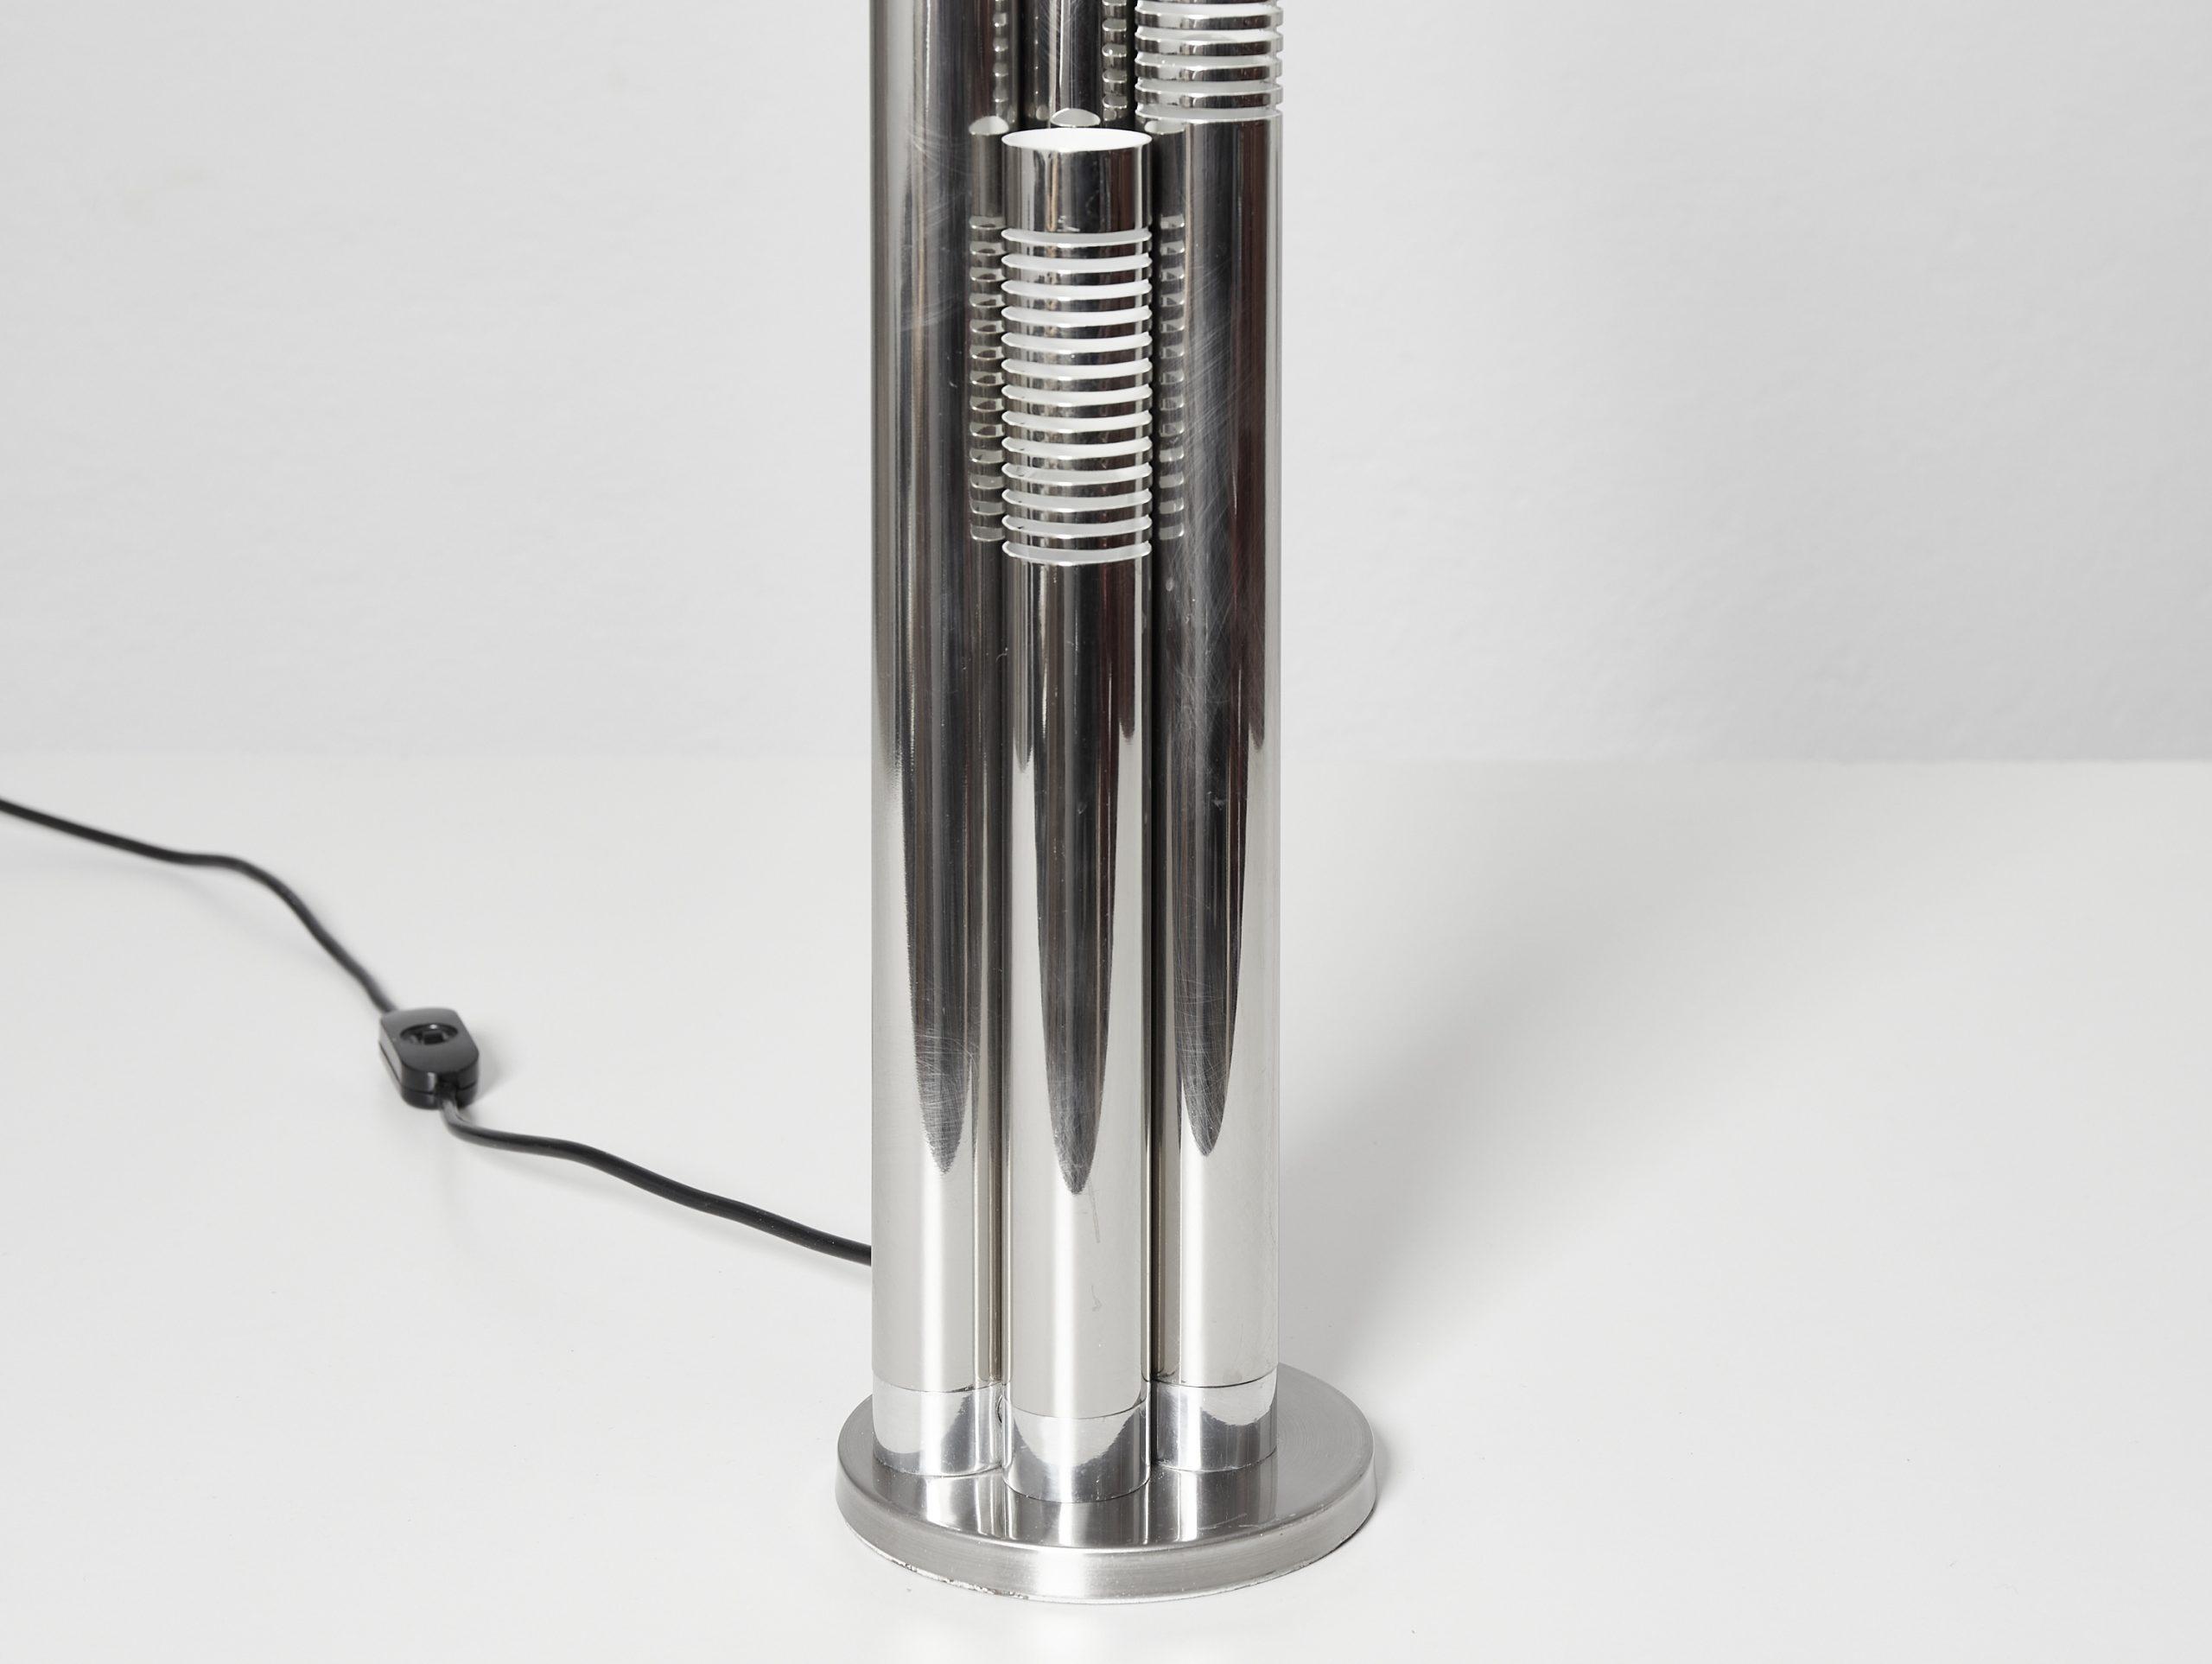 italian-chromed-metal-tubular-table-lamp-c-1970-image-07